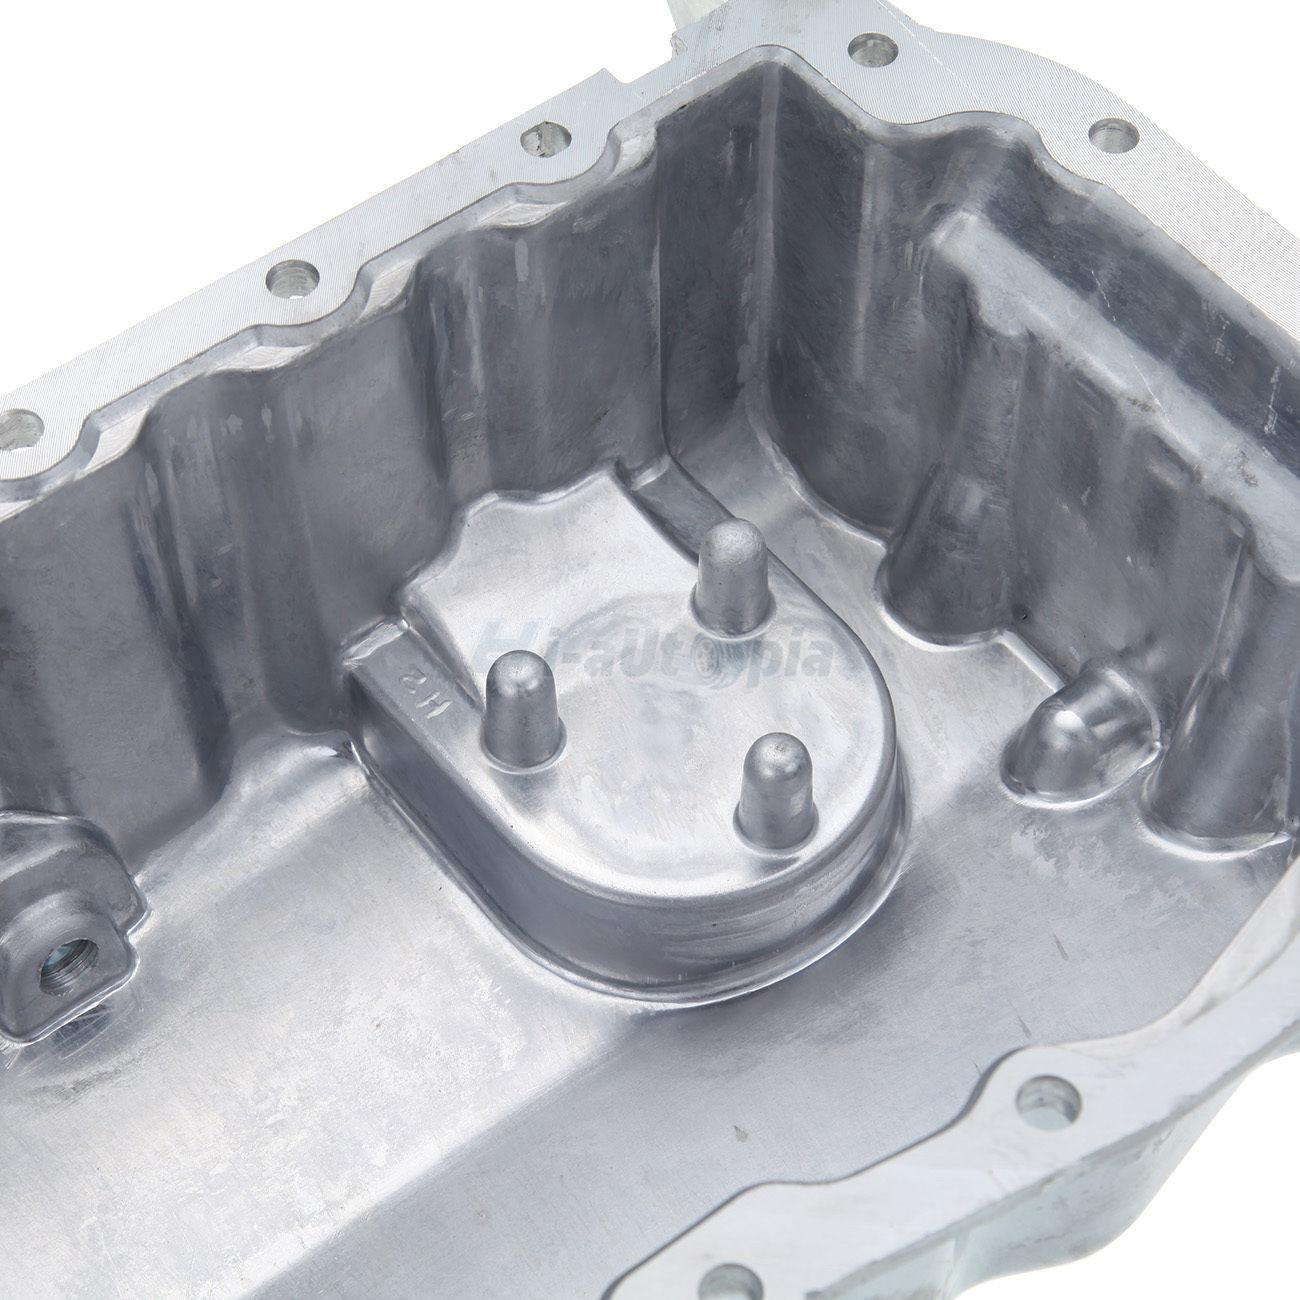 Vw Bug Motor Oil: Engine Oil Pan For VW Beetle Golf JETTA 1.9L 2.0L